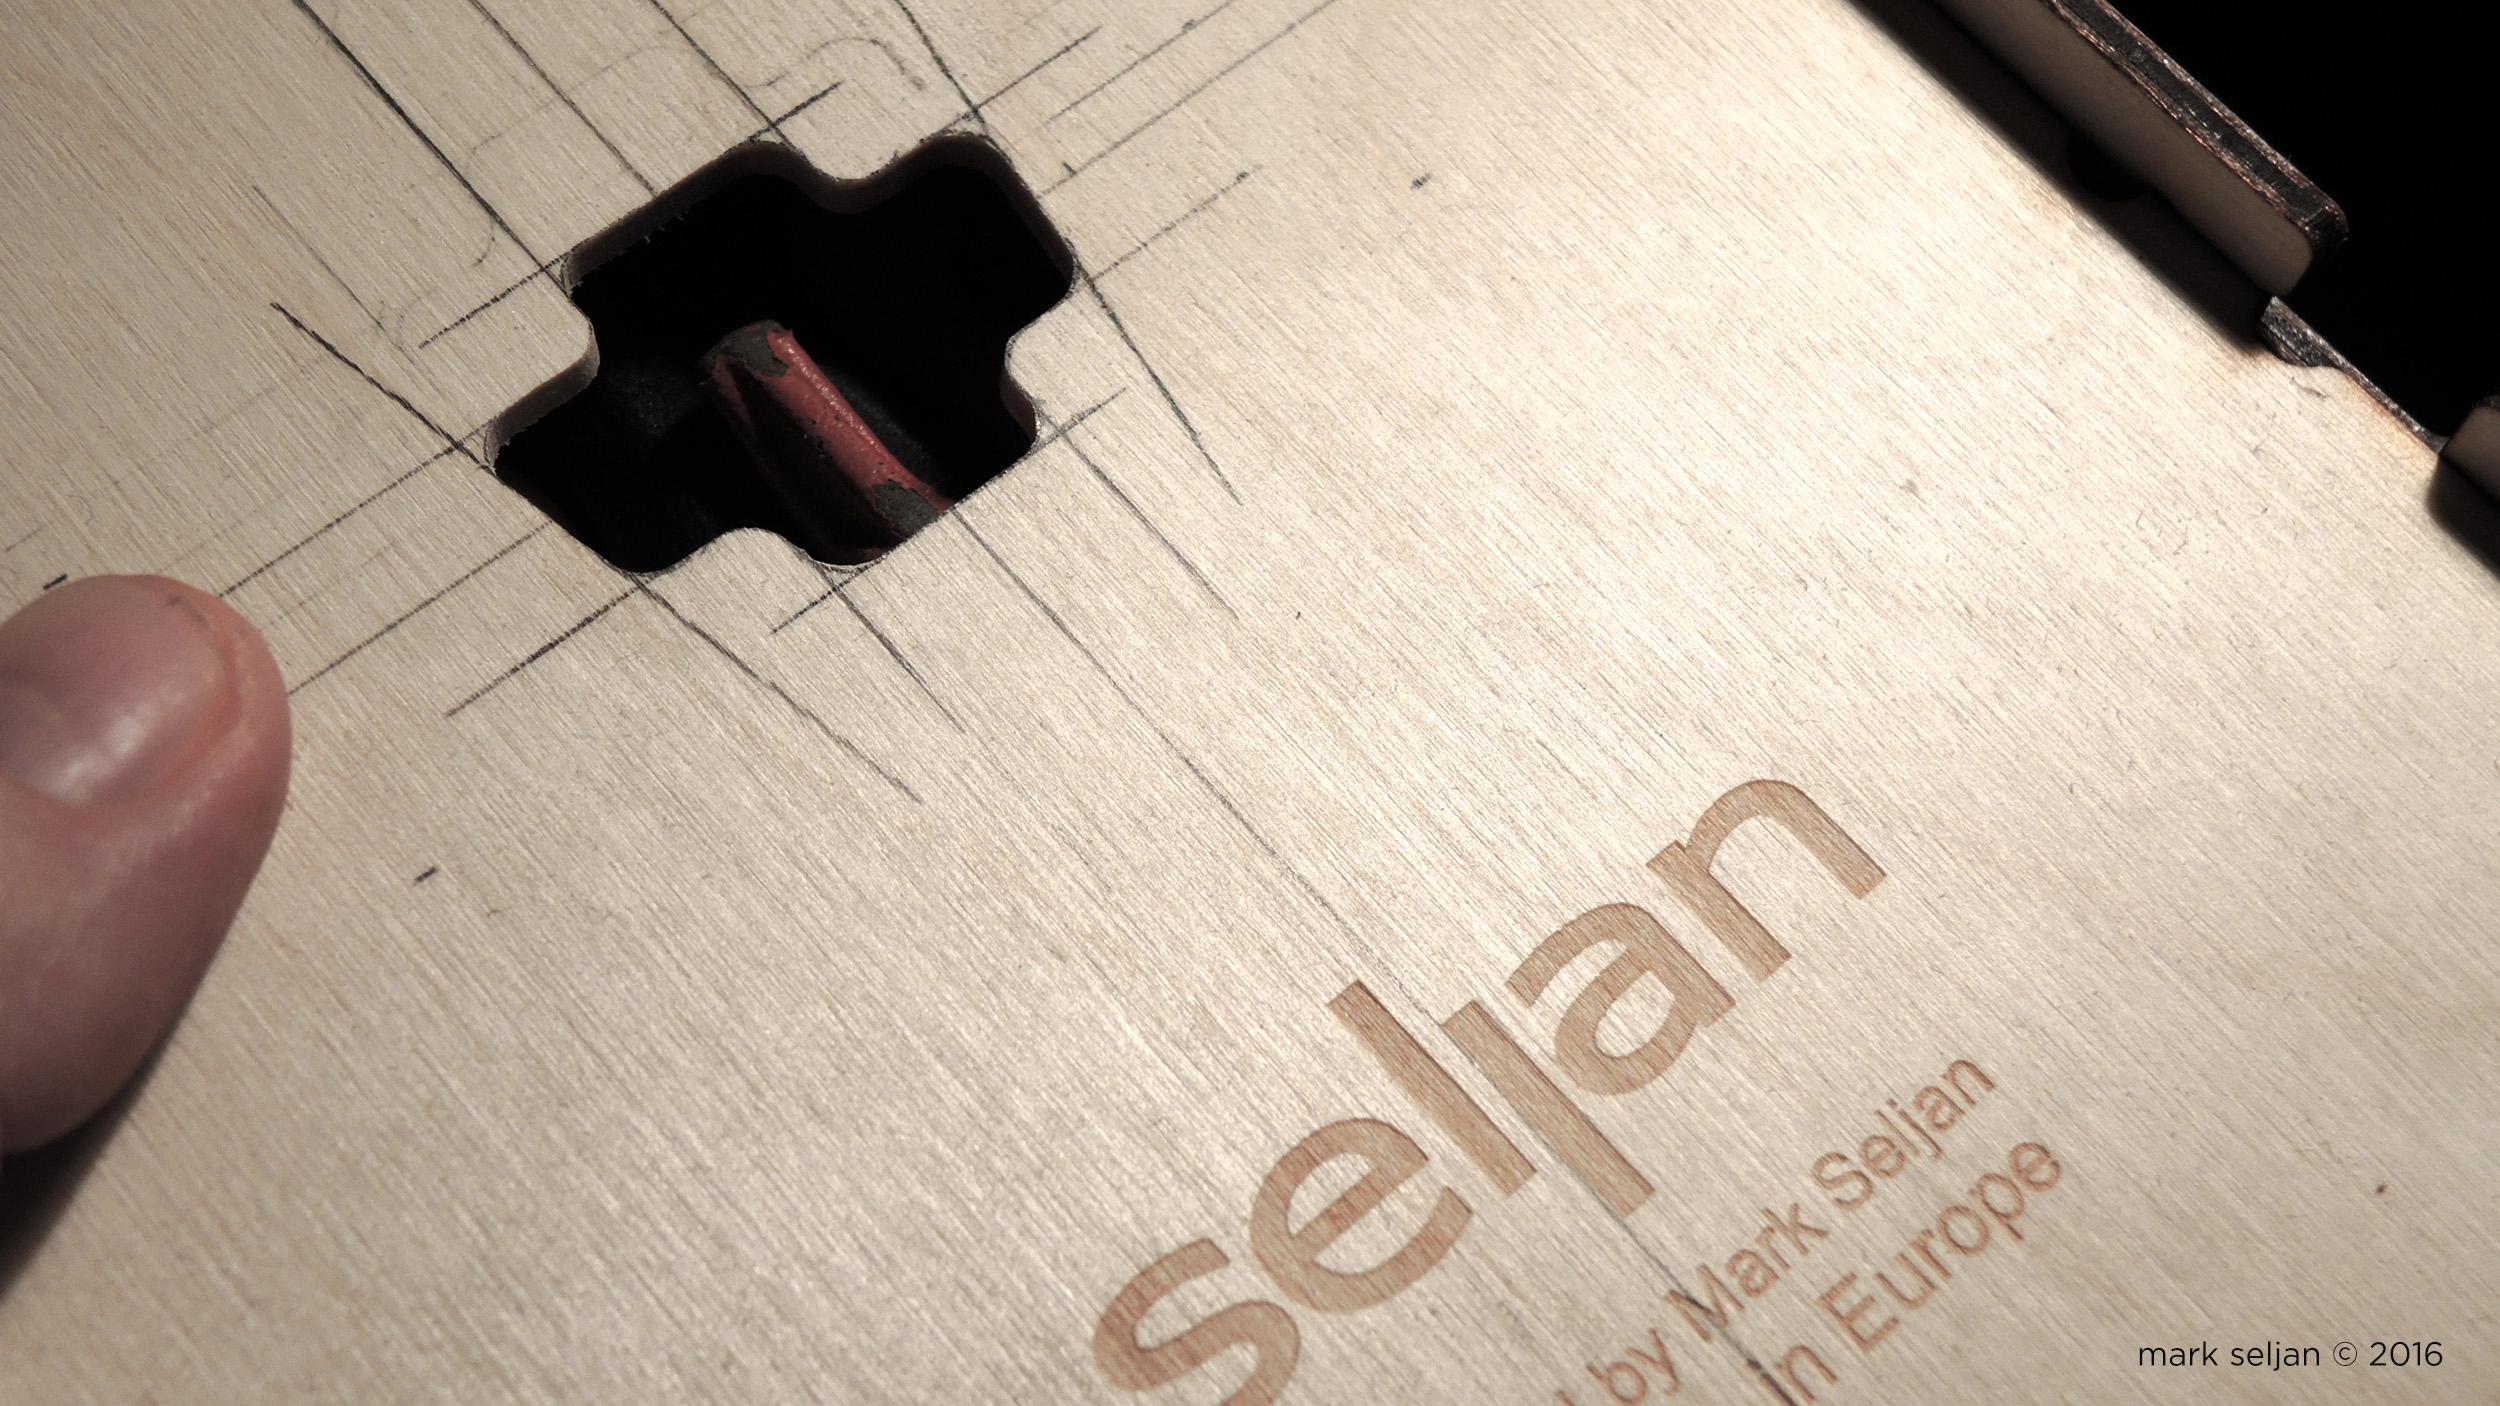 Seljan - The Slant - Package